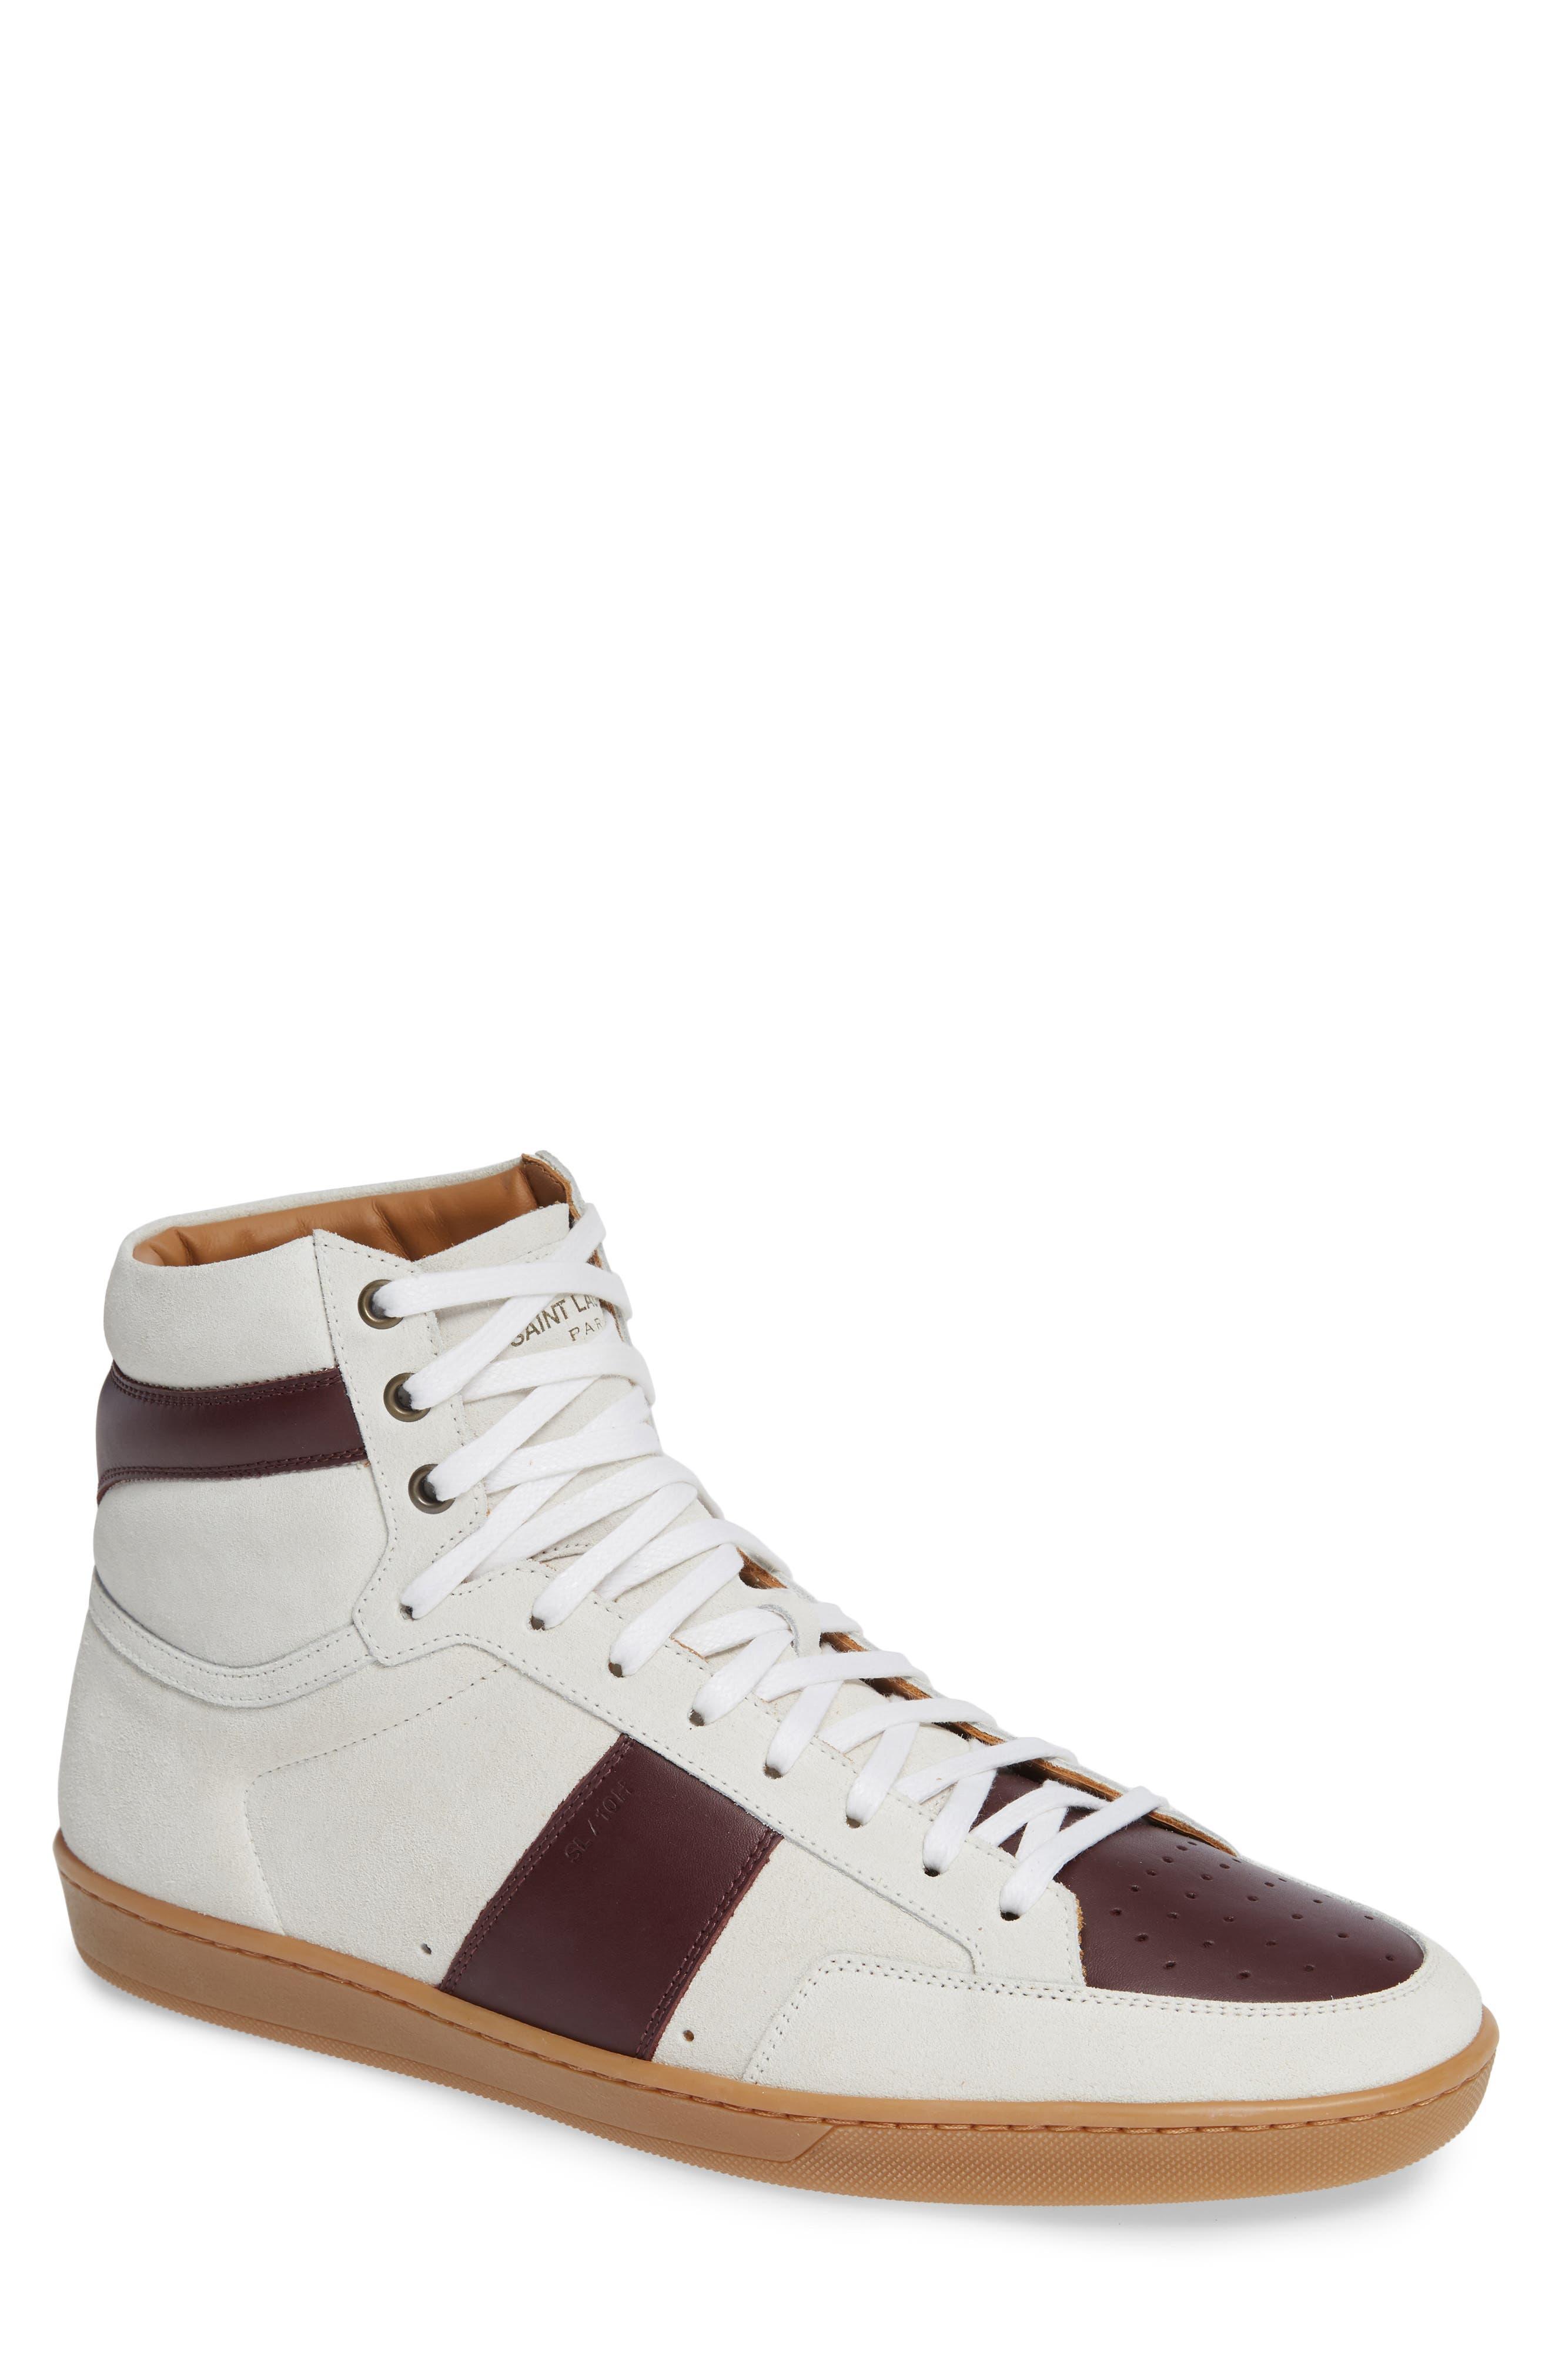 SL/10H Signature Court Classic High-Top Sneaker,                             Main thumbnail 1, color,                             Milk/ Barolo